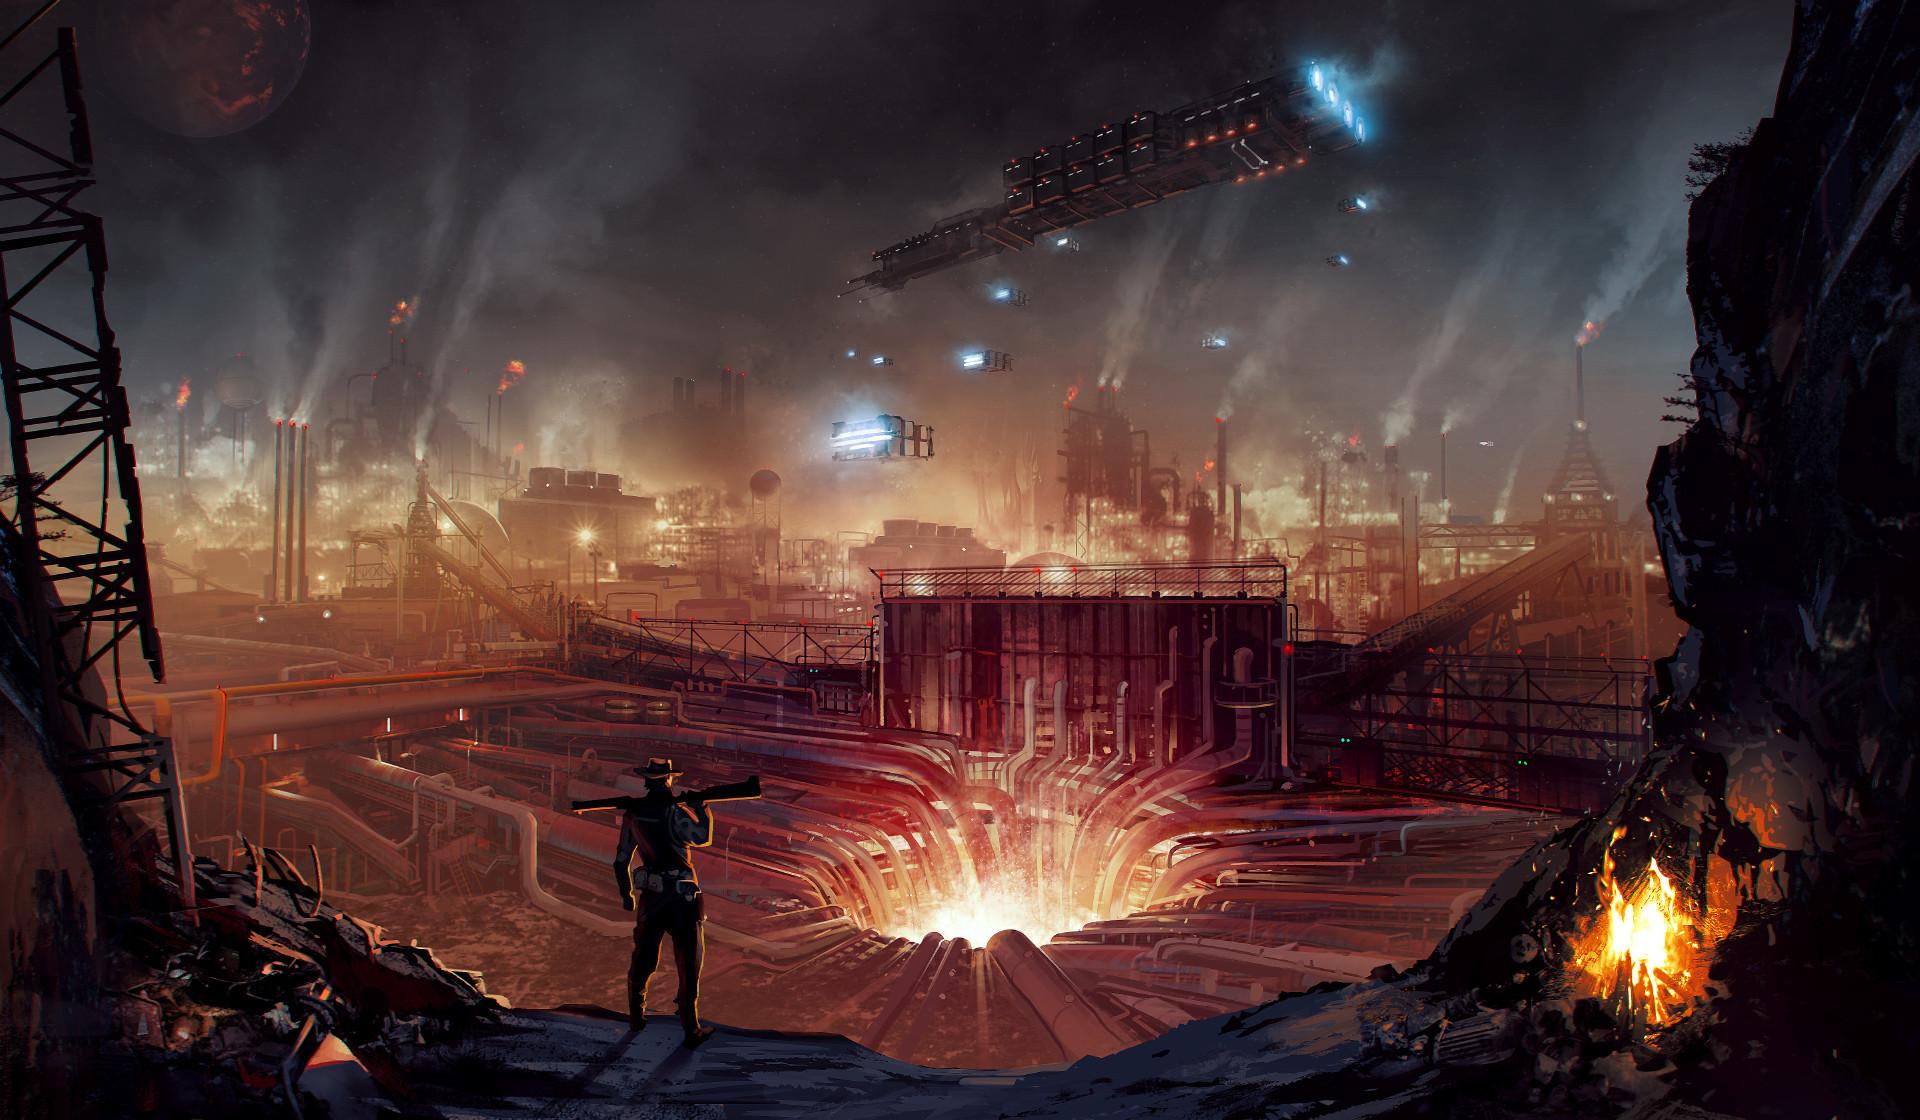 alex-monge-industrial-hellhole-artstatio